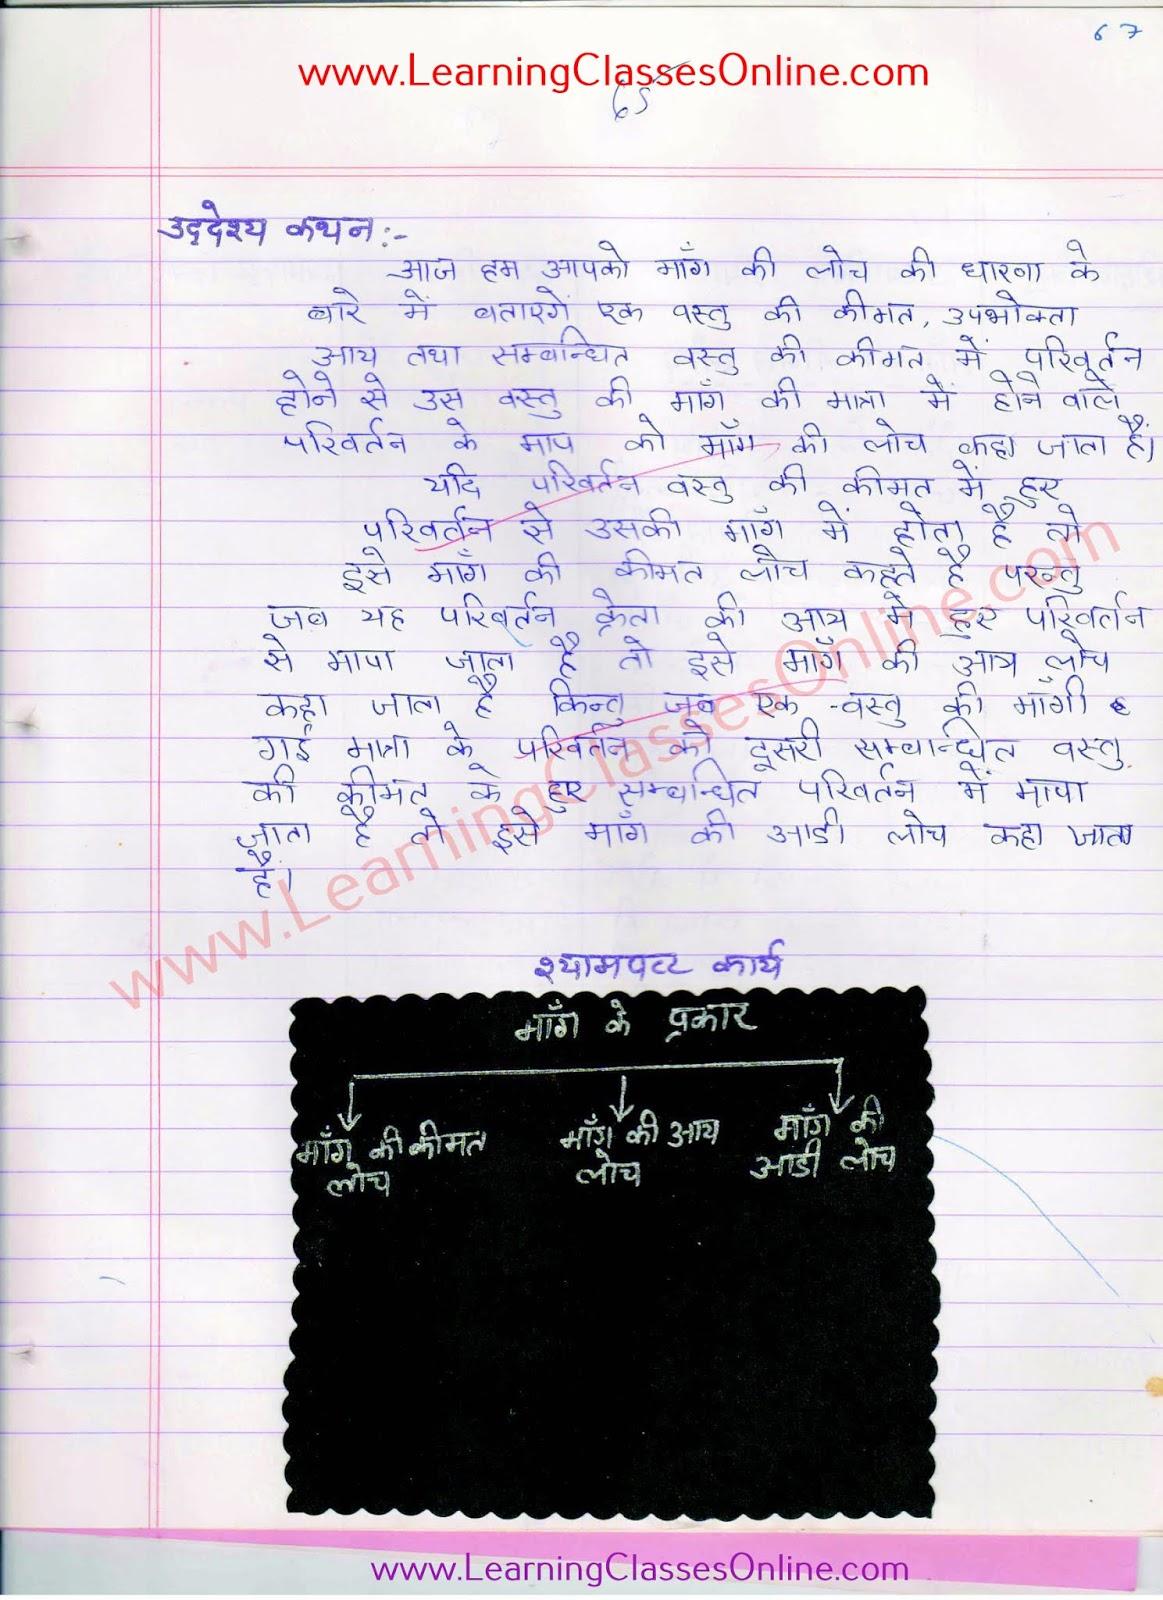 arthsastra mang ki loch lesson plan in hindi